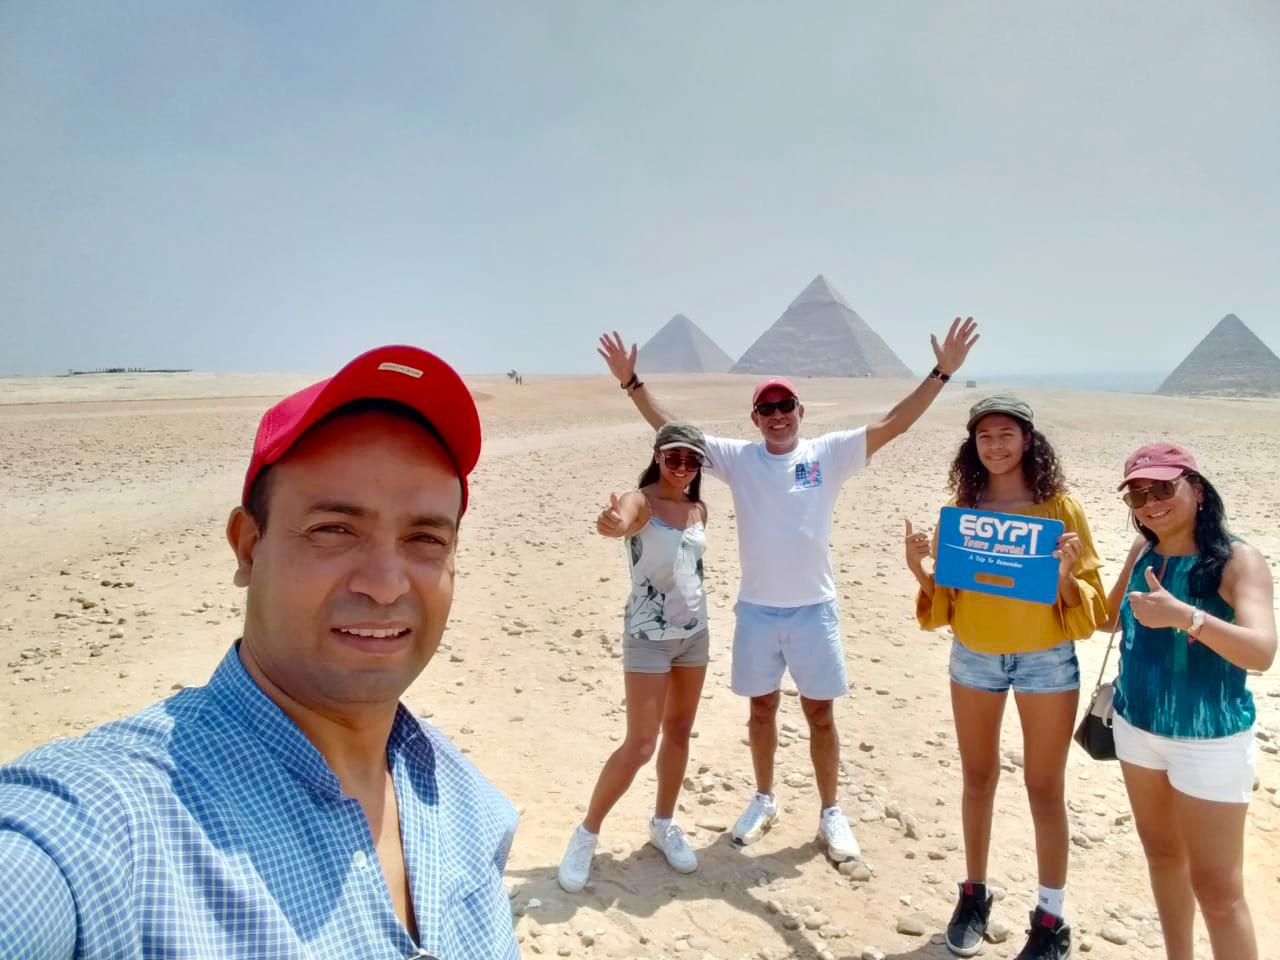 Giza Pyramids -10 Days Recreational Trip to Egypt | Egypt Itinerary 10 Days